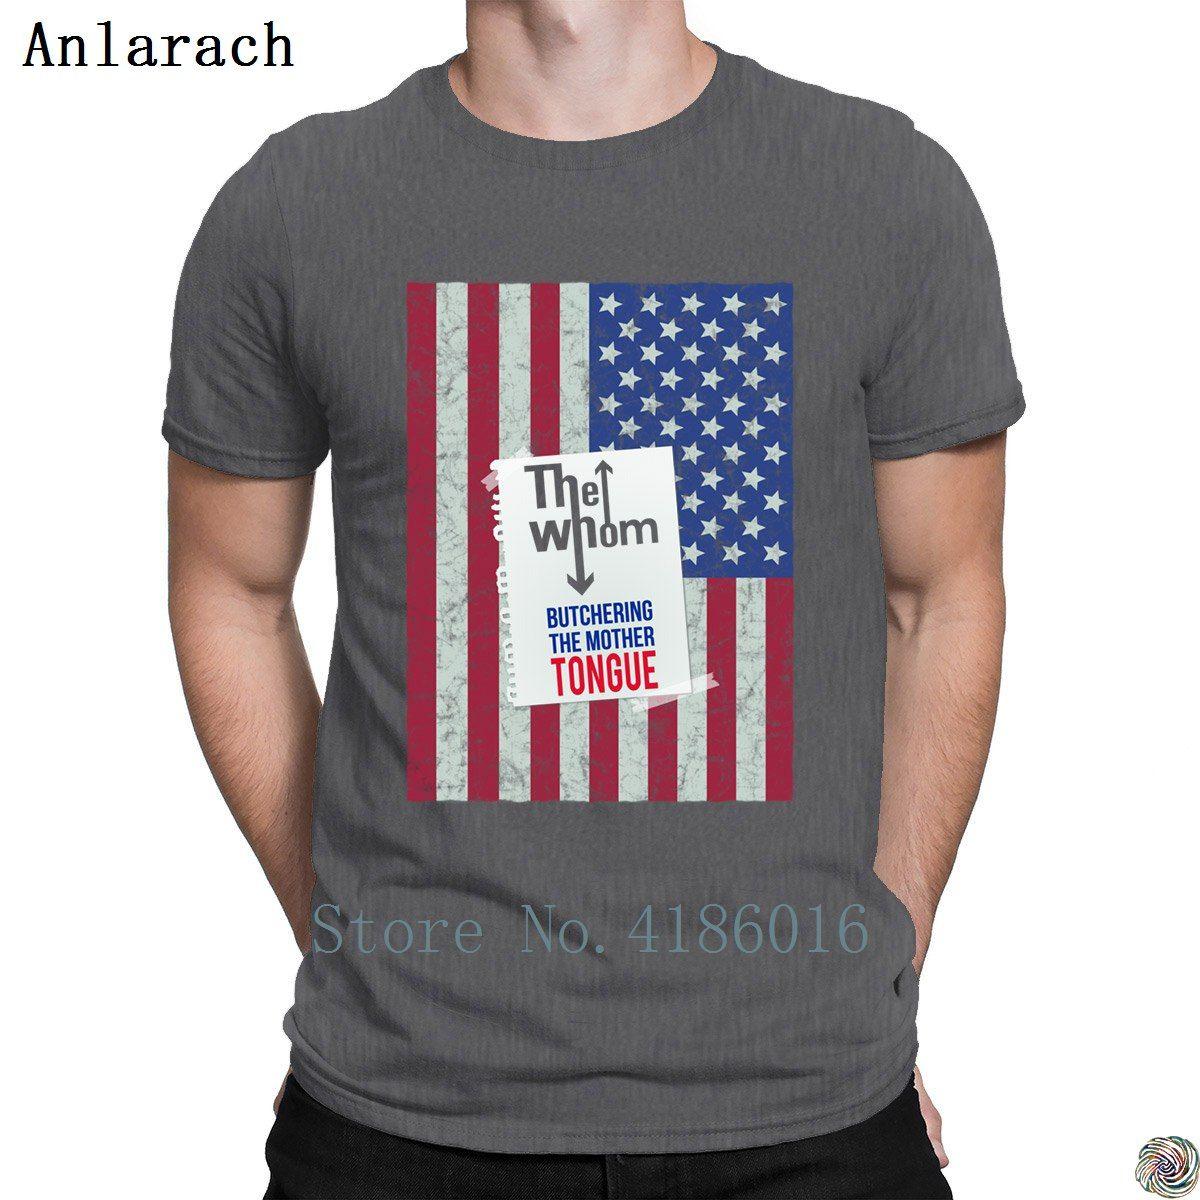 Compre Camiseta De La Camiseta Butchering The Mother Tongue Camiseta ...